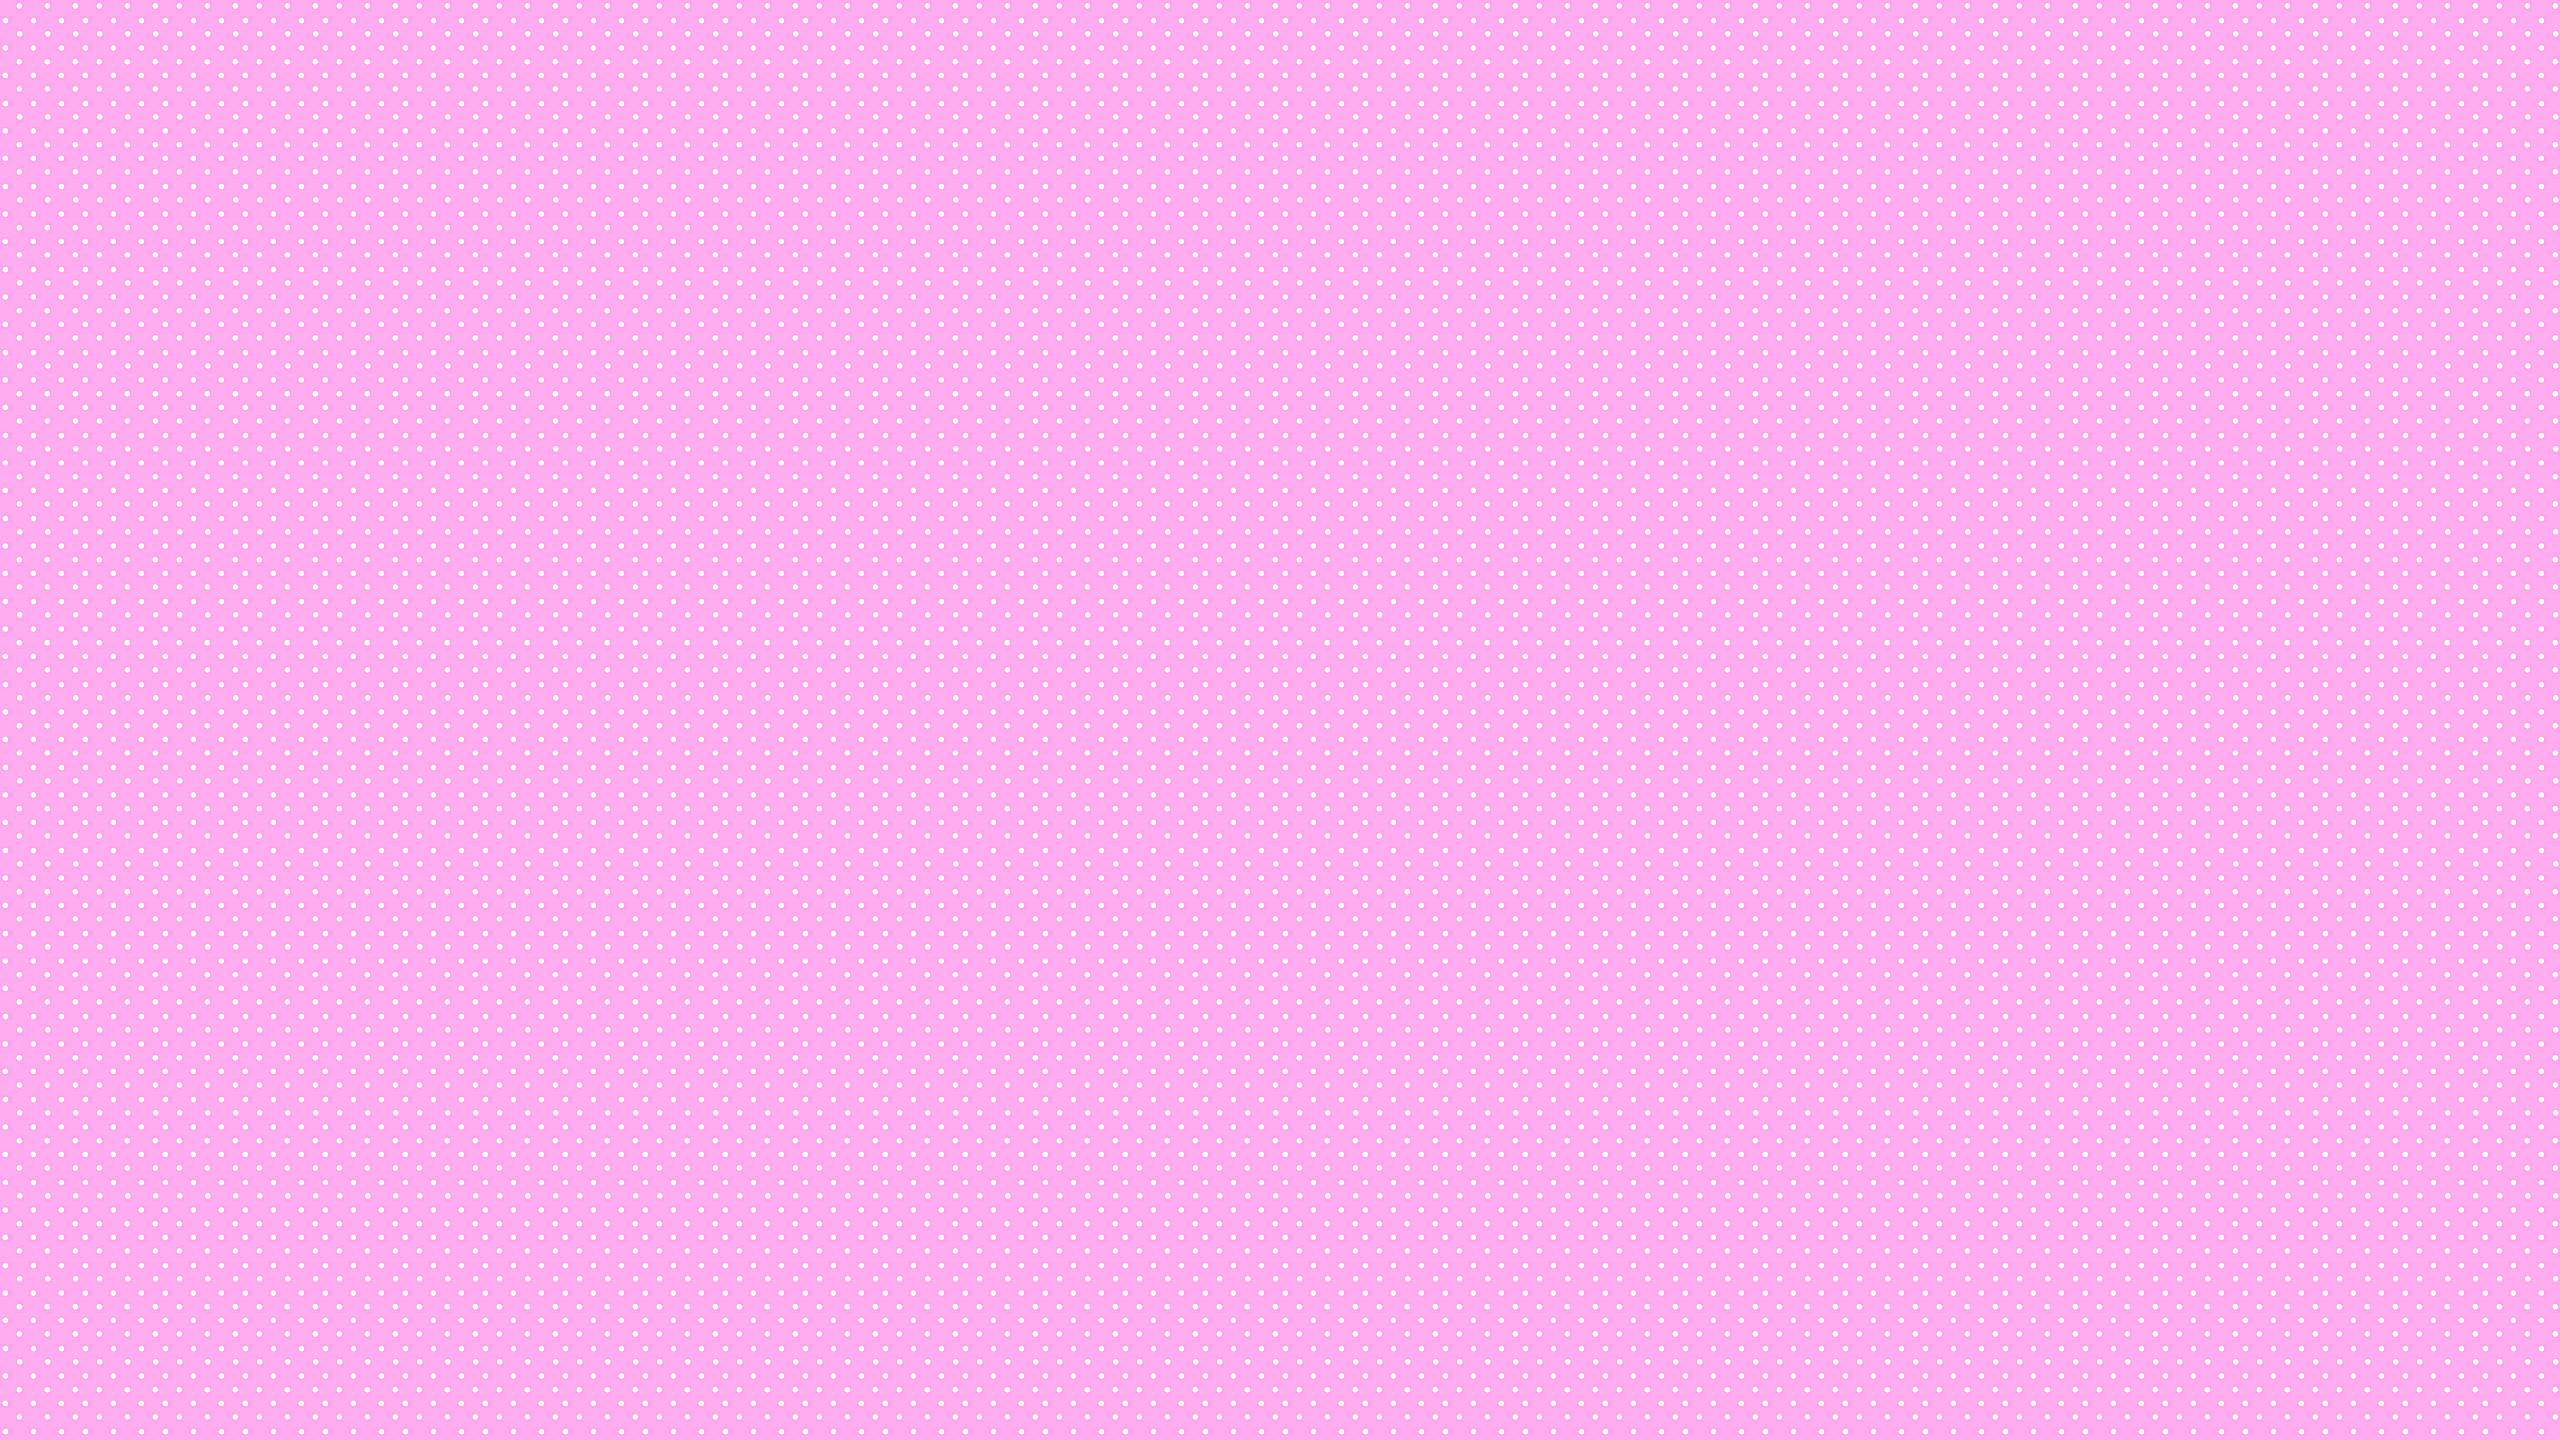 Pink pastel wallpapers wallpaper desktop   1238772 2560x1440